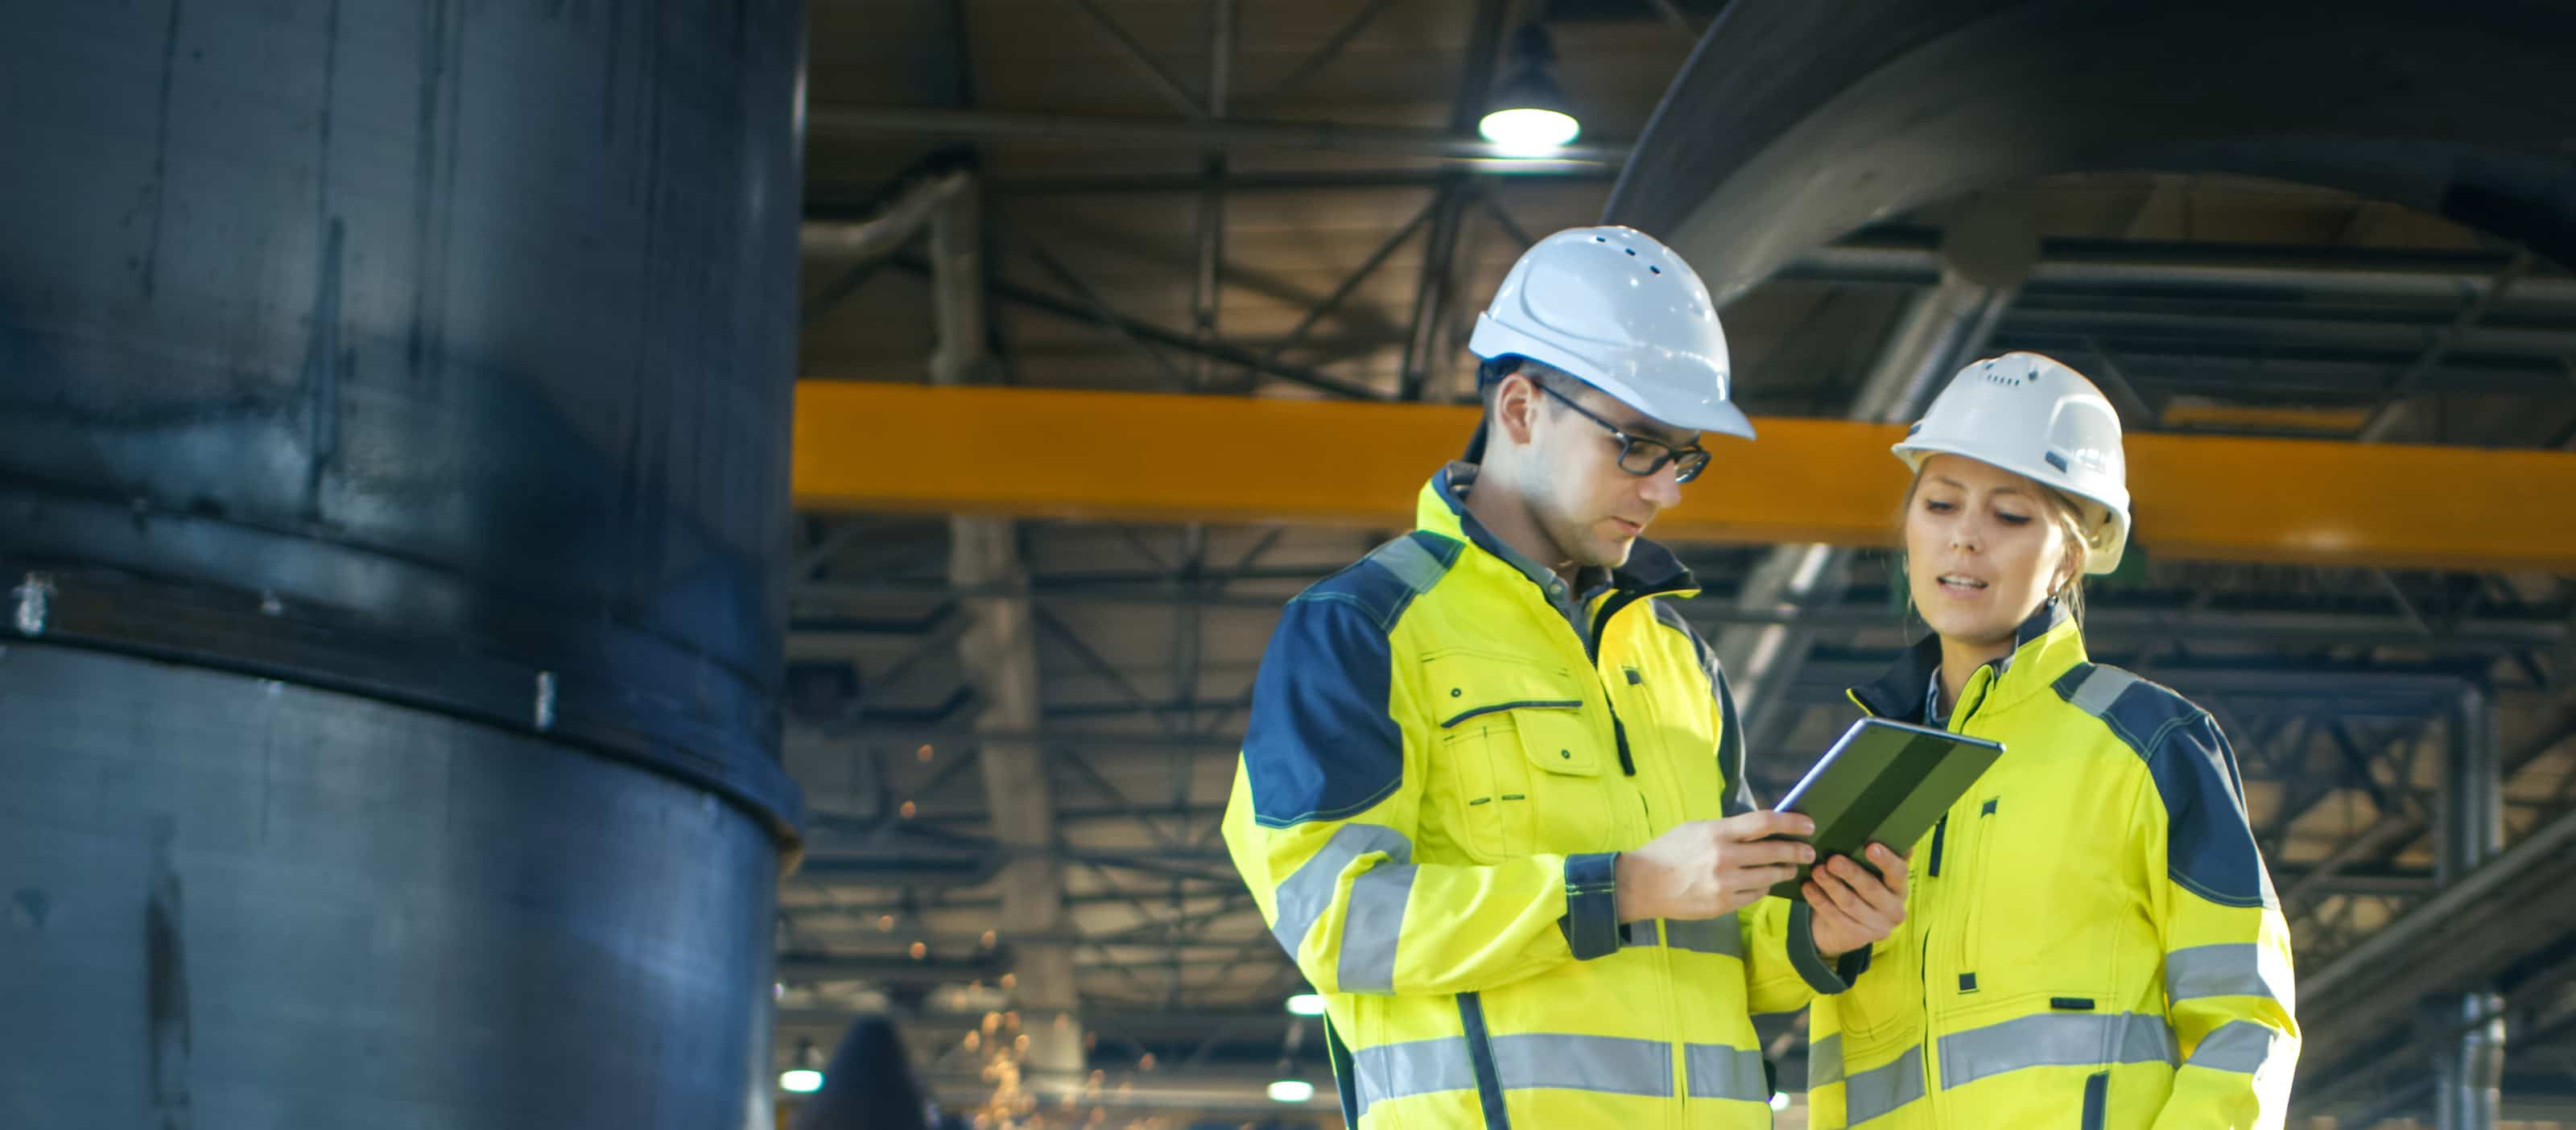 HMI/SCADA software in use in industrial operations | GE Digital